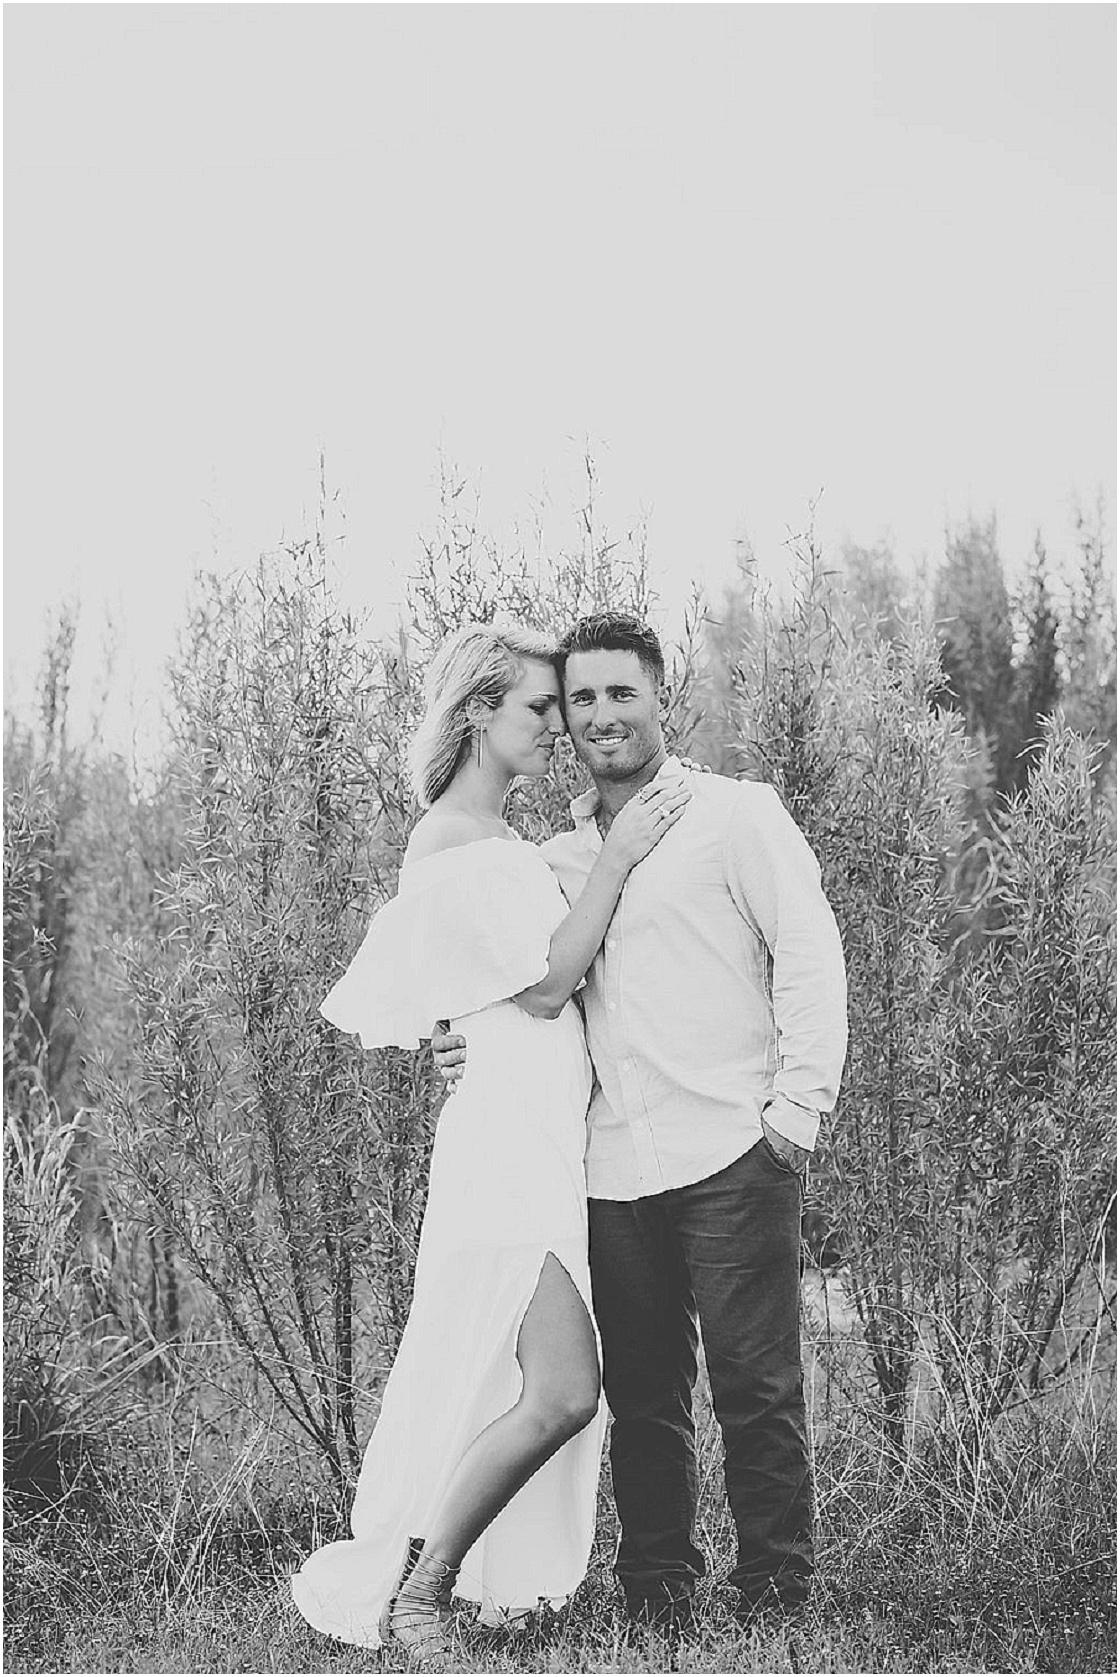 Beach Engagement | City Engagement | Lauren Reynolds Photography | Joy Wed blog | http://www.joy-wed.com